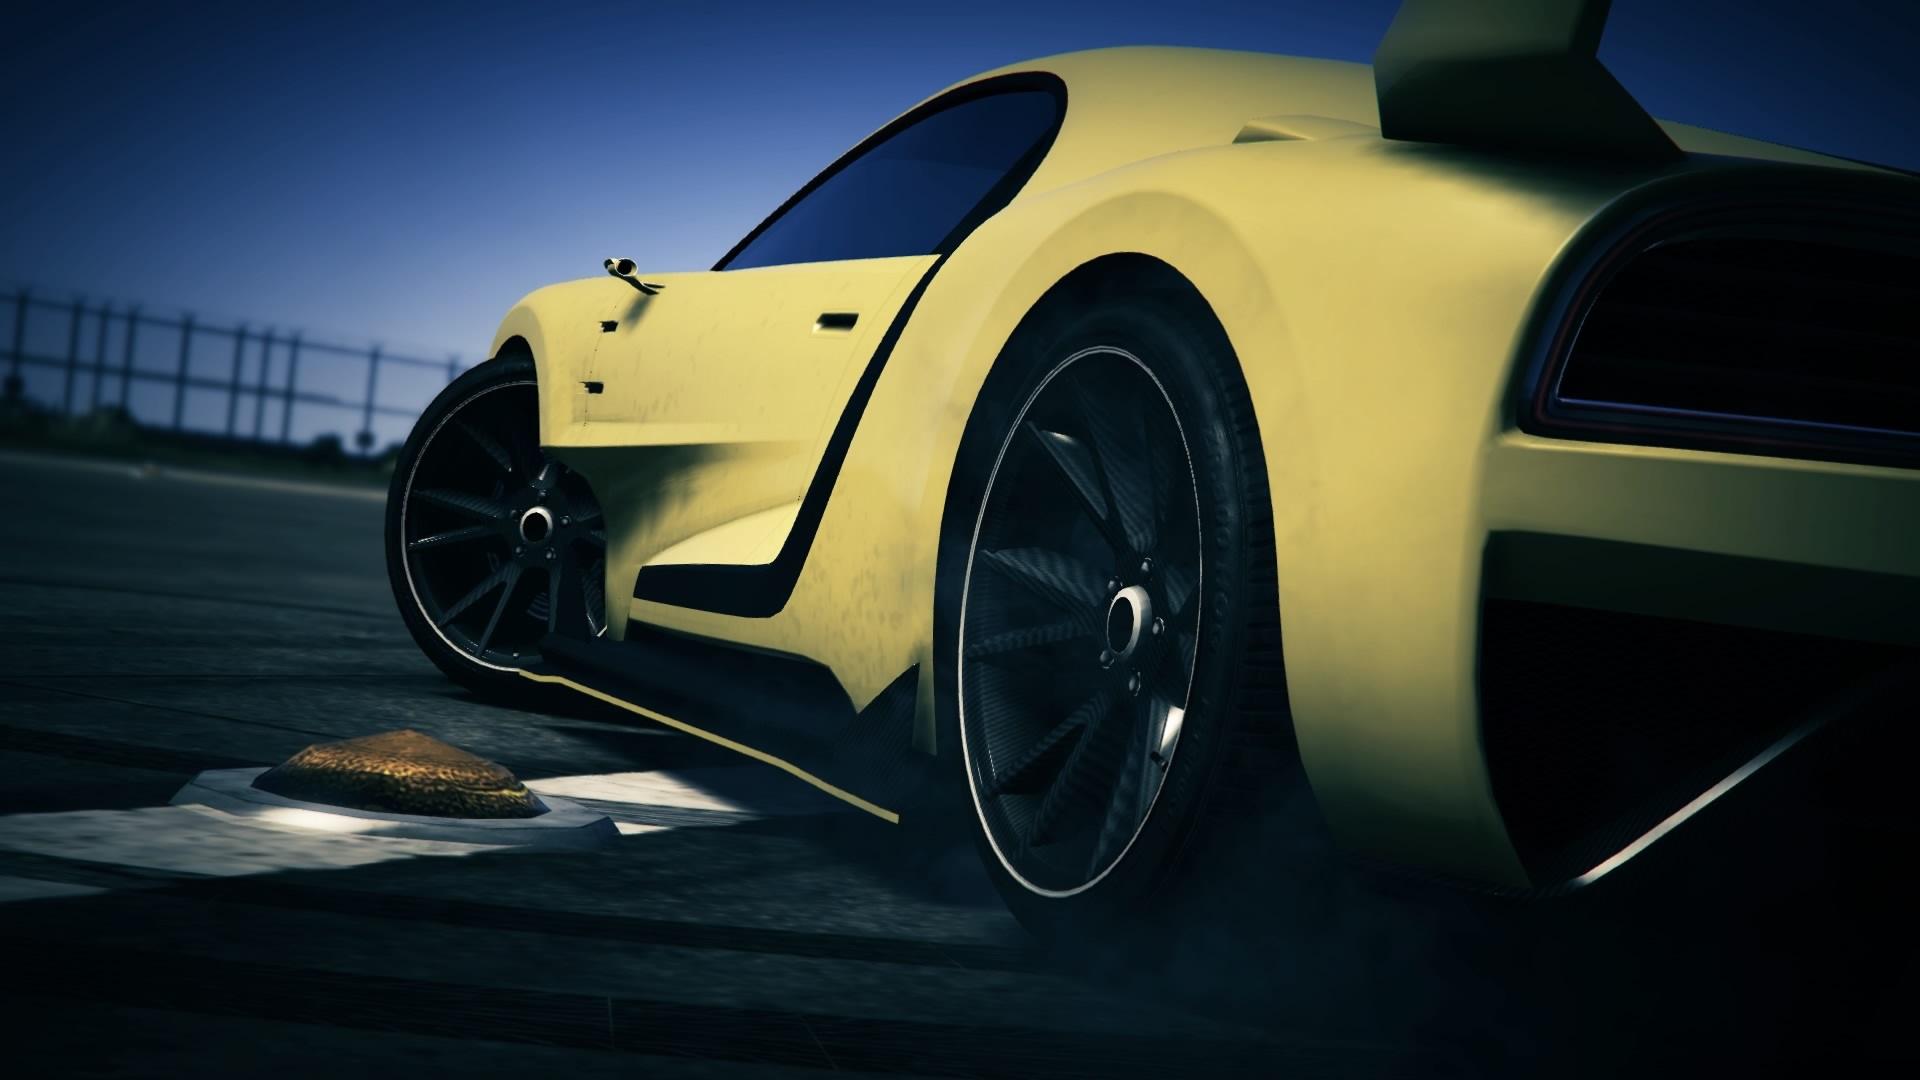 Grand_Theft_Auto_V_20170722111348.jpg